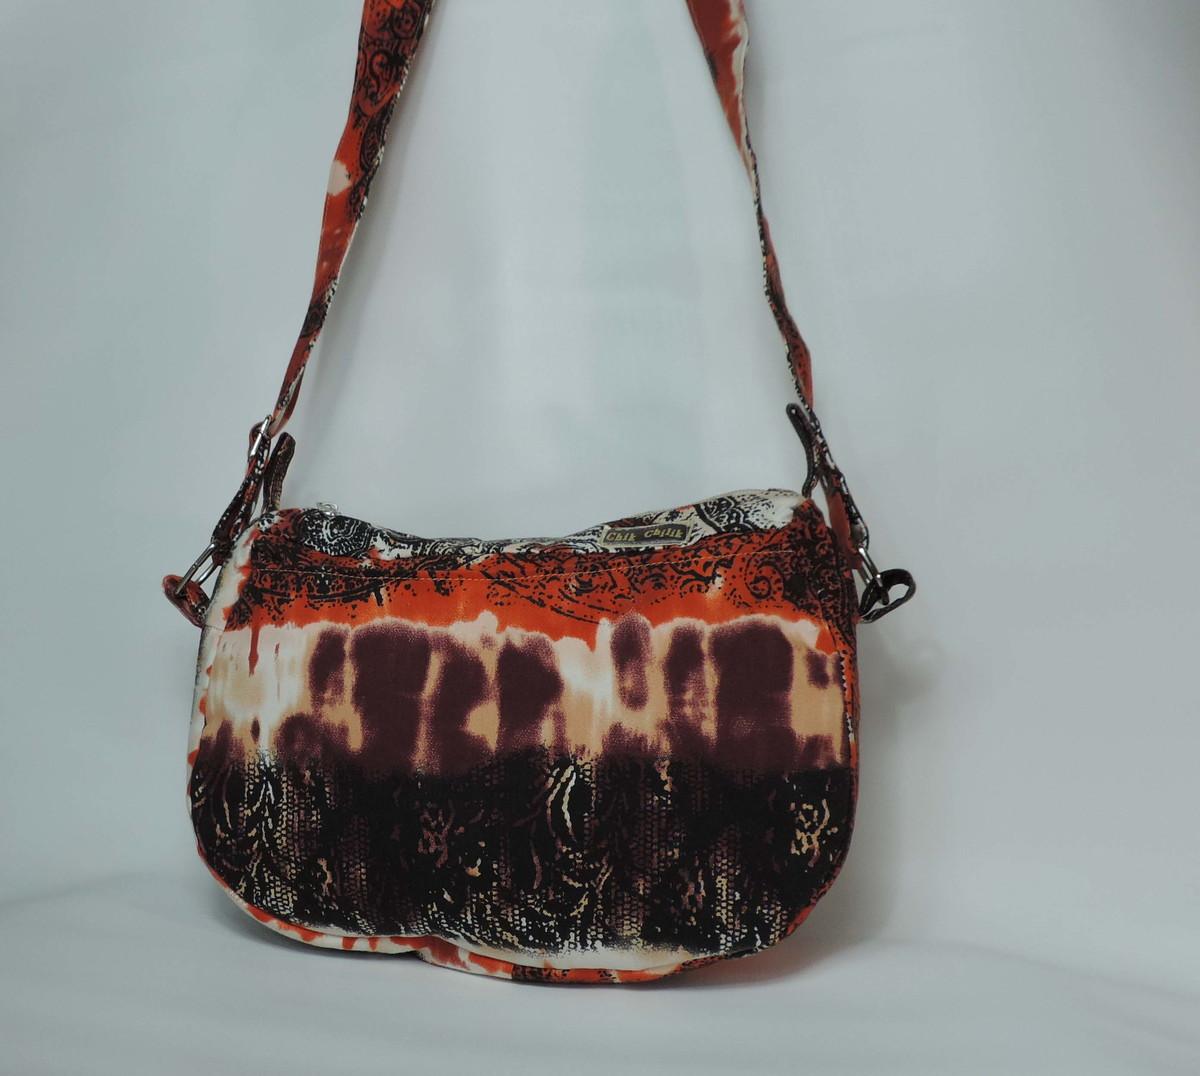 Bolsa De Ombro Lateral : Bolsa feminina atelier chik chilik elo